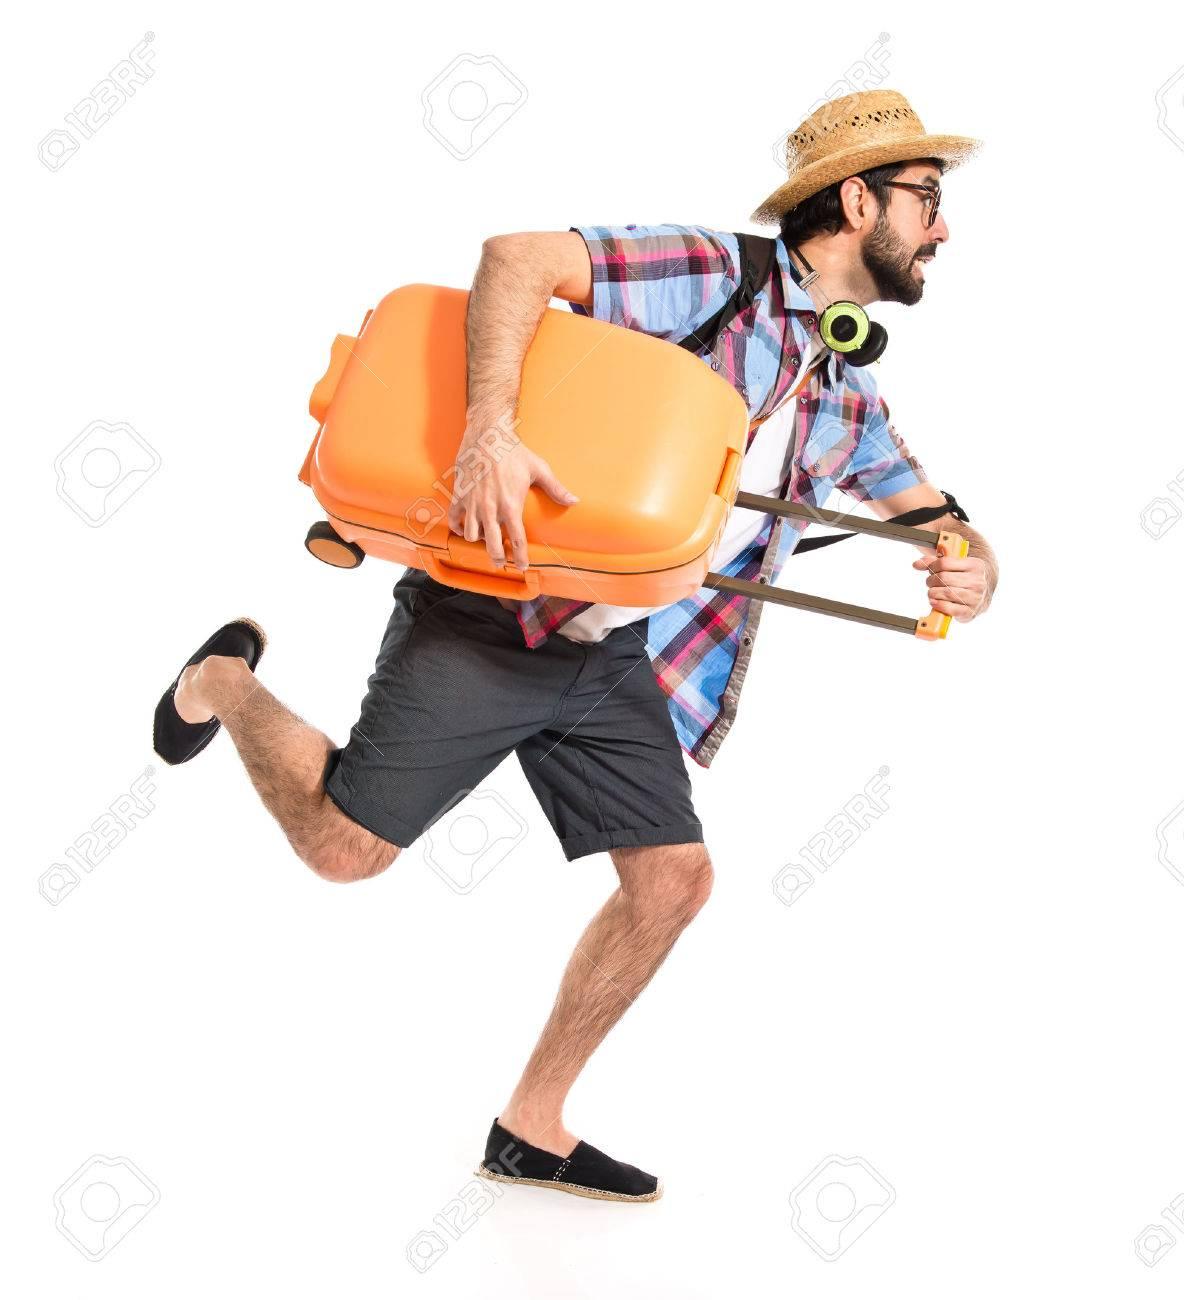 Tourist running fast - 39083623